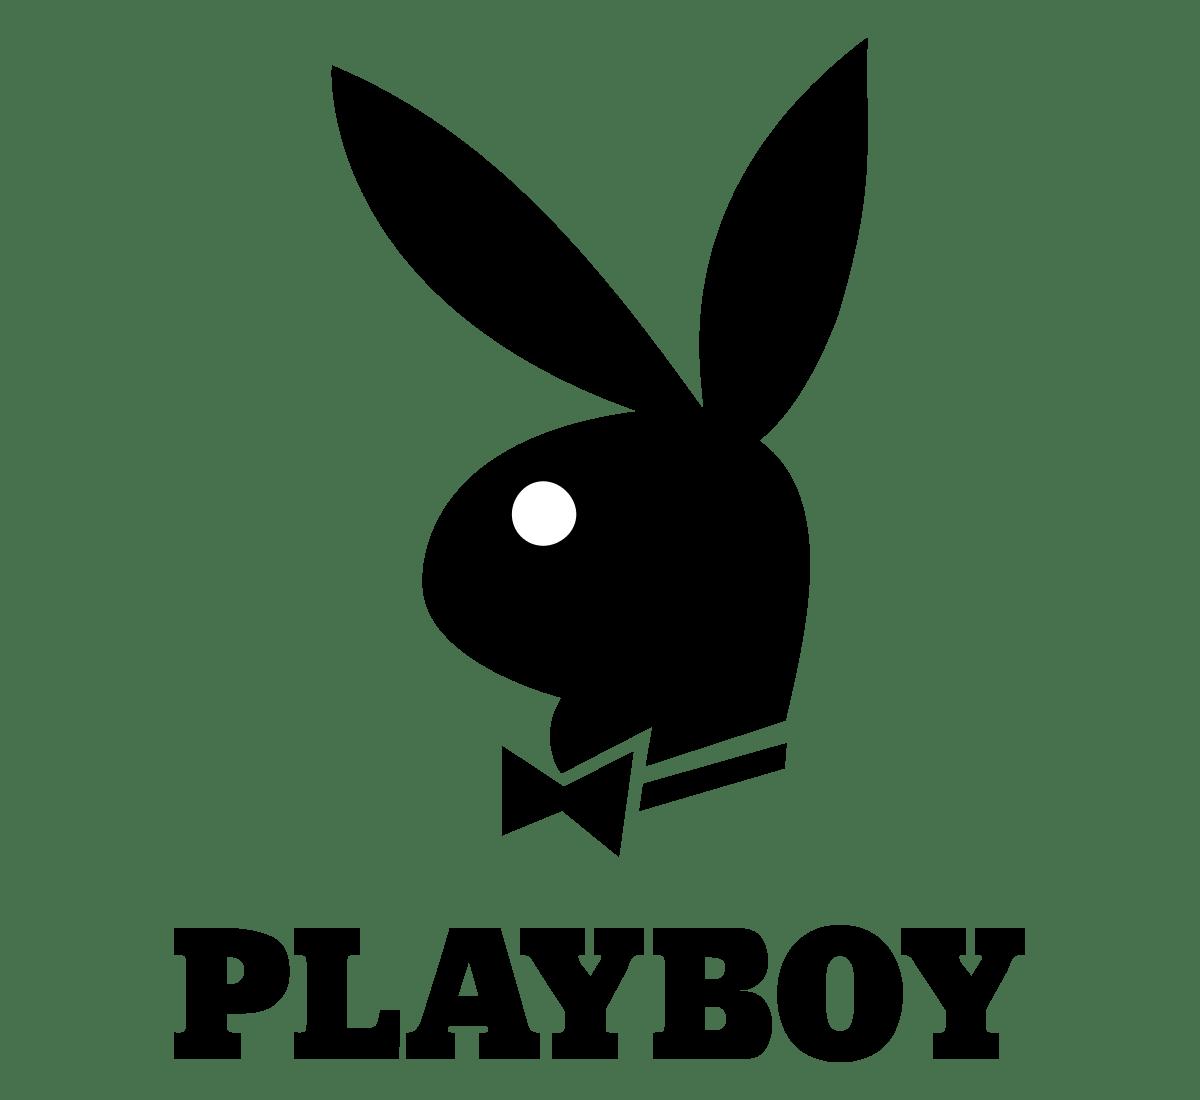 https://i1.wp.com/1000logos.net/wp-content/uploads/2017/05/Playboy-Logo.png